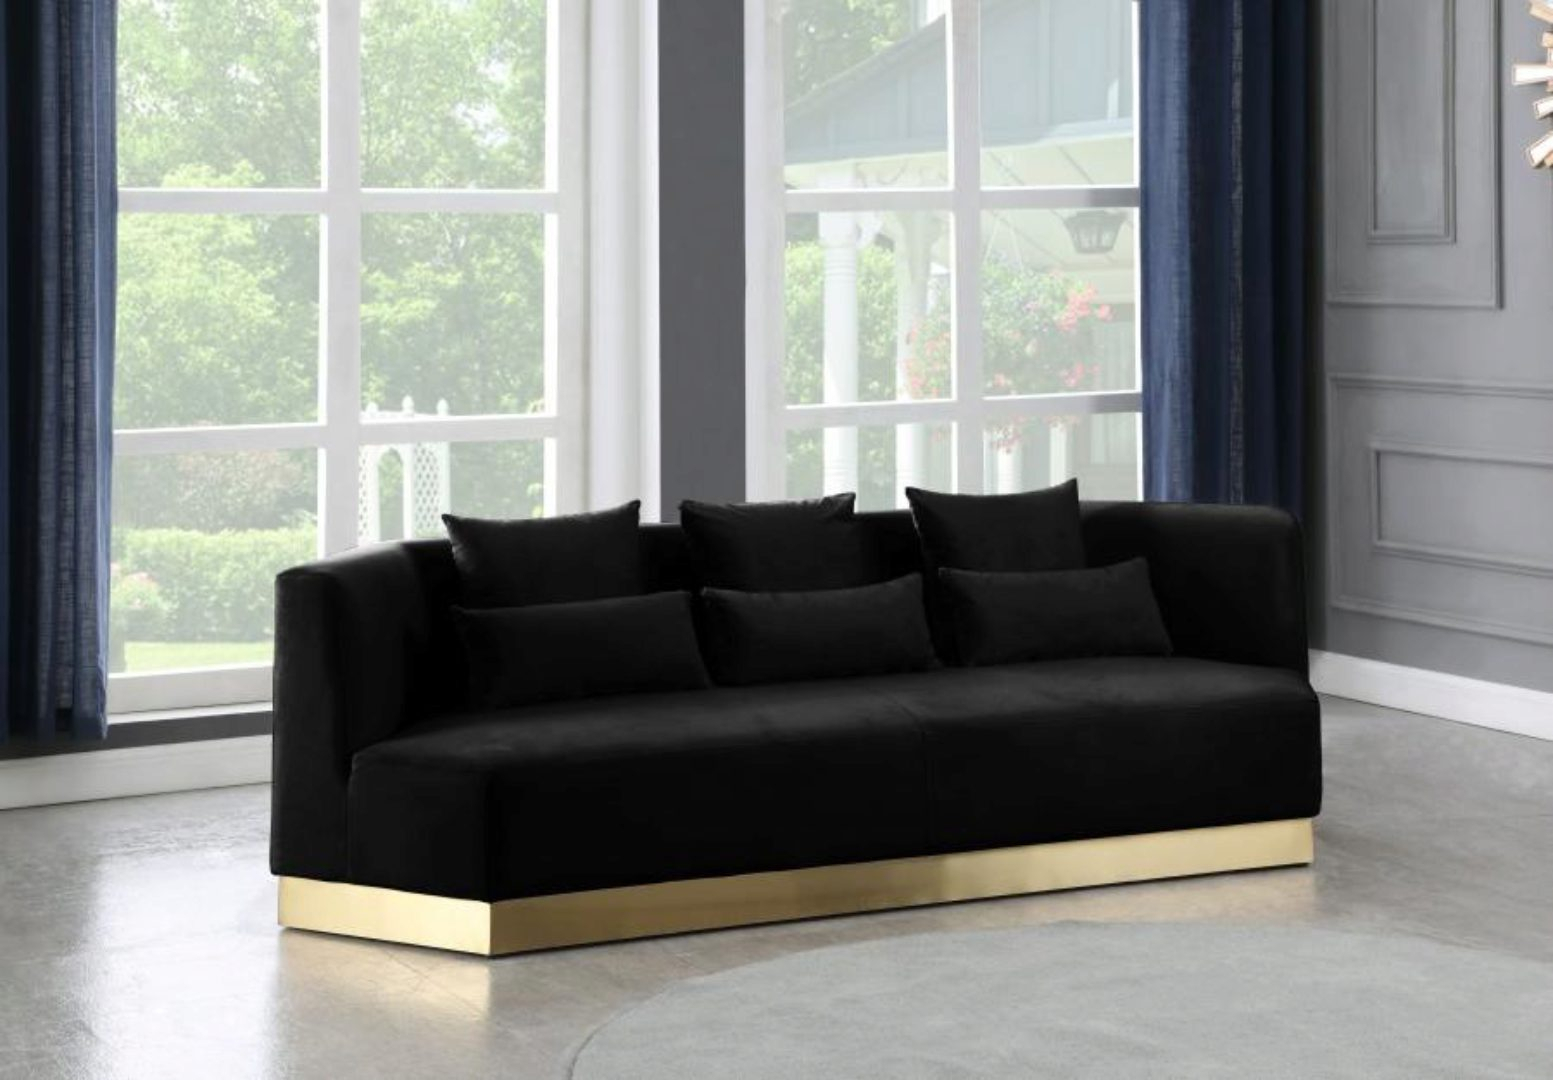 Black Velvet Sofa Curved Design Contemporary Meridian With Regard To Strummer Velvet Sectional Sofas (View 8 of 15)